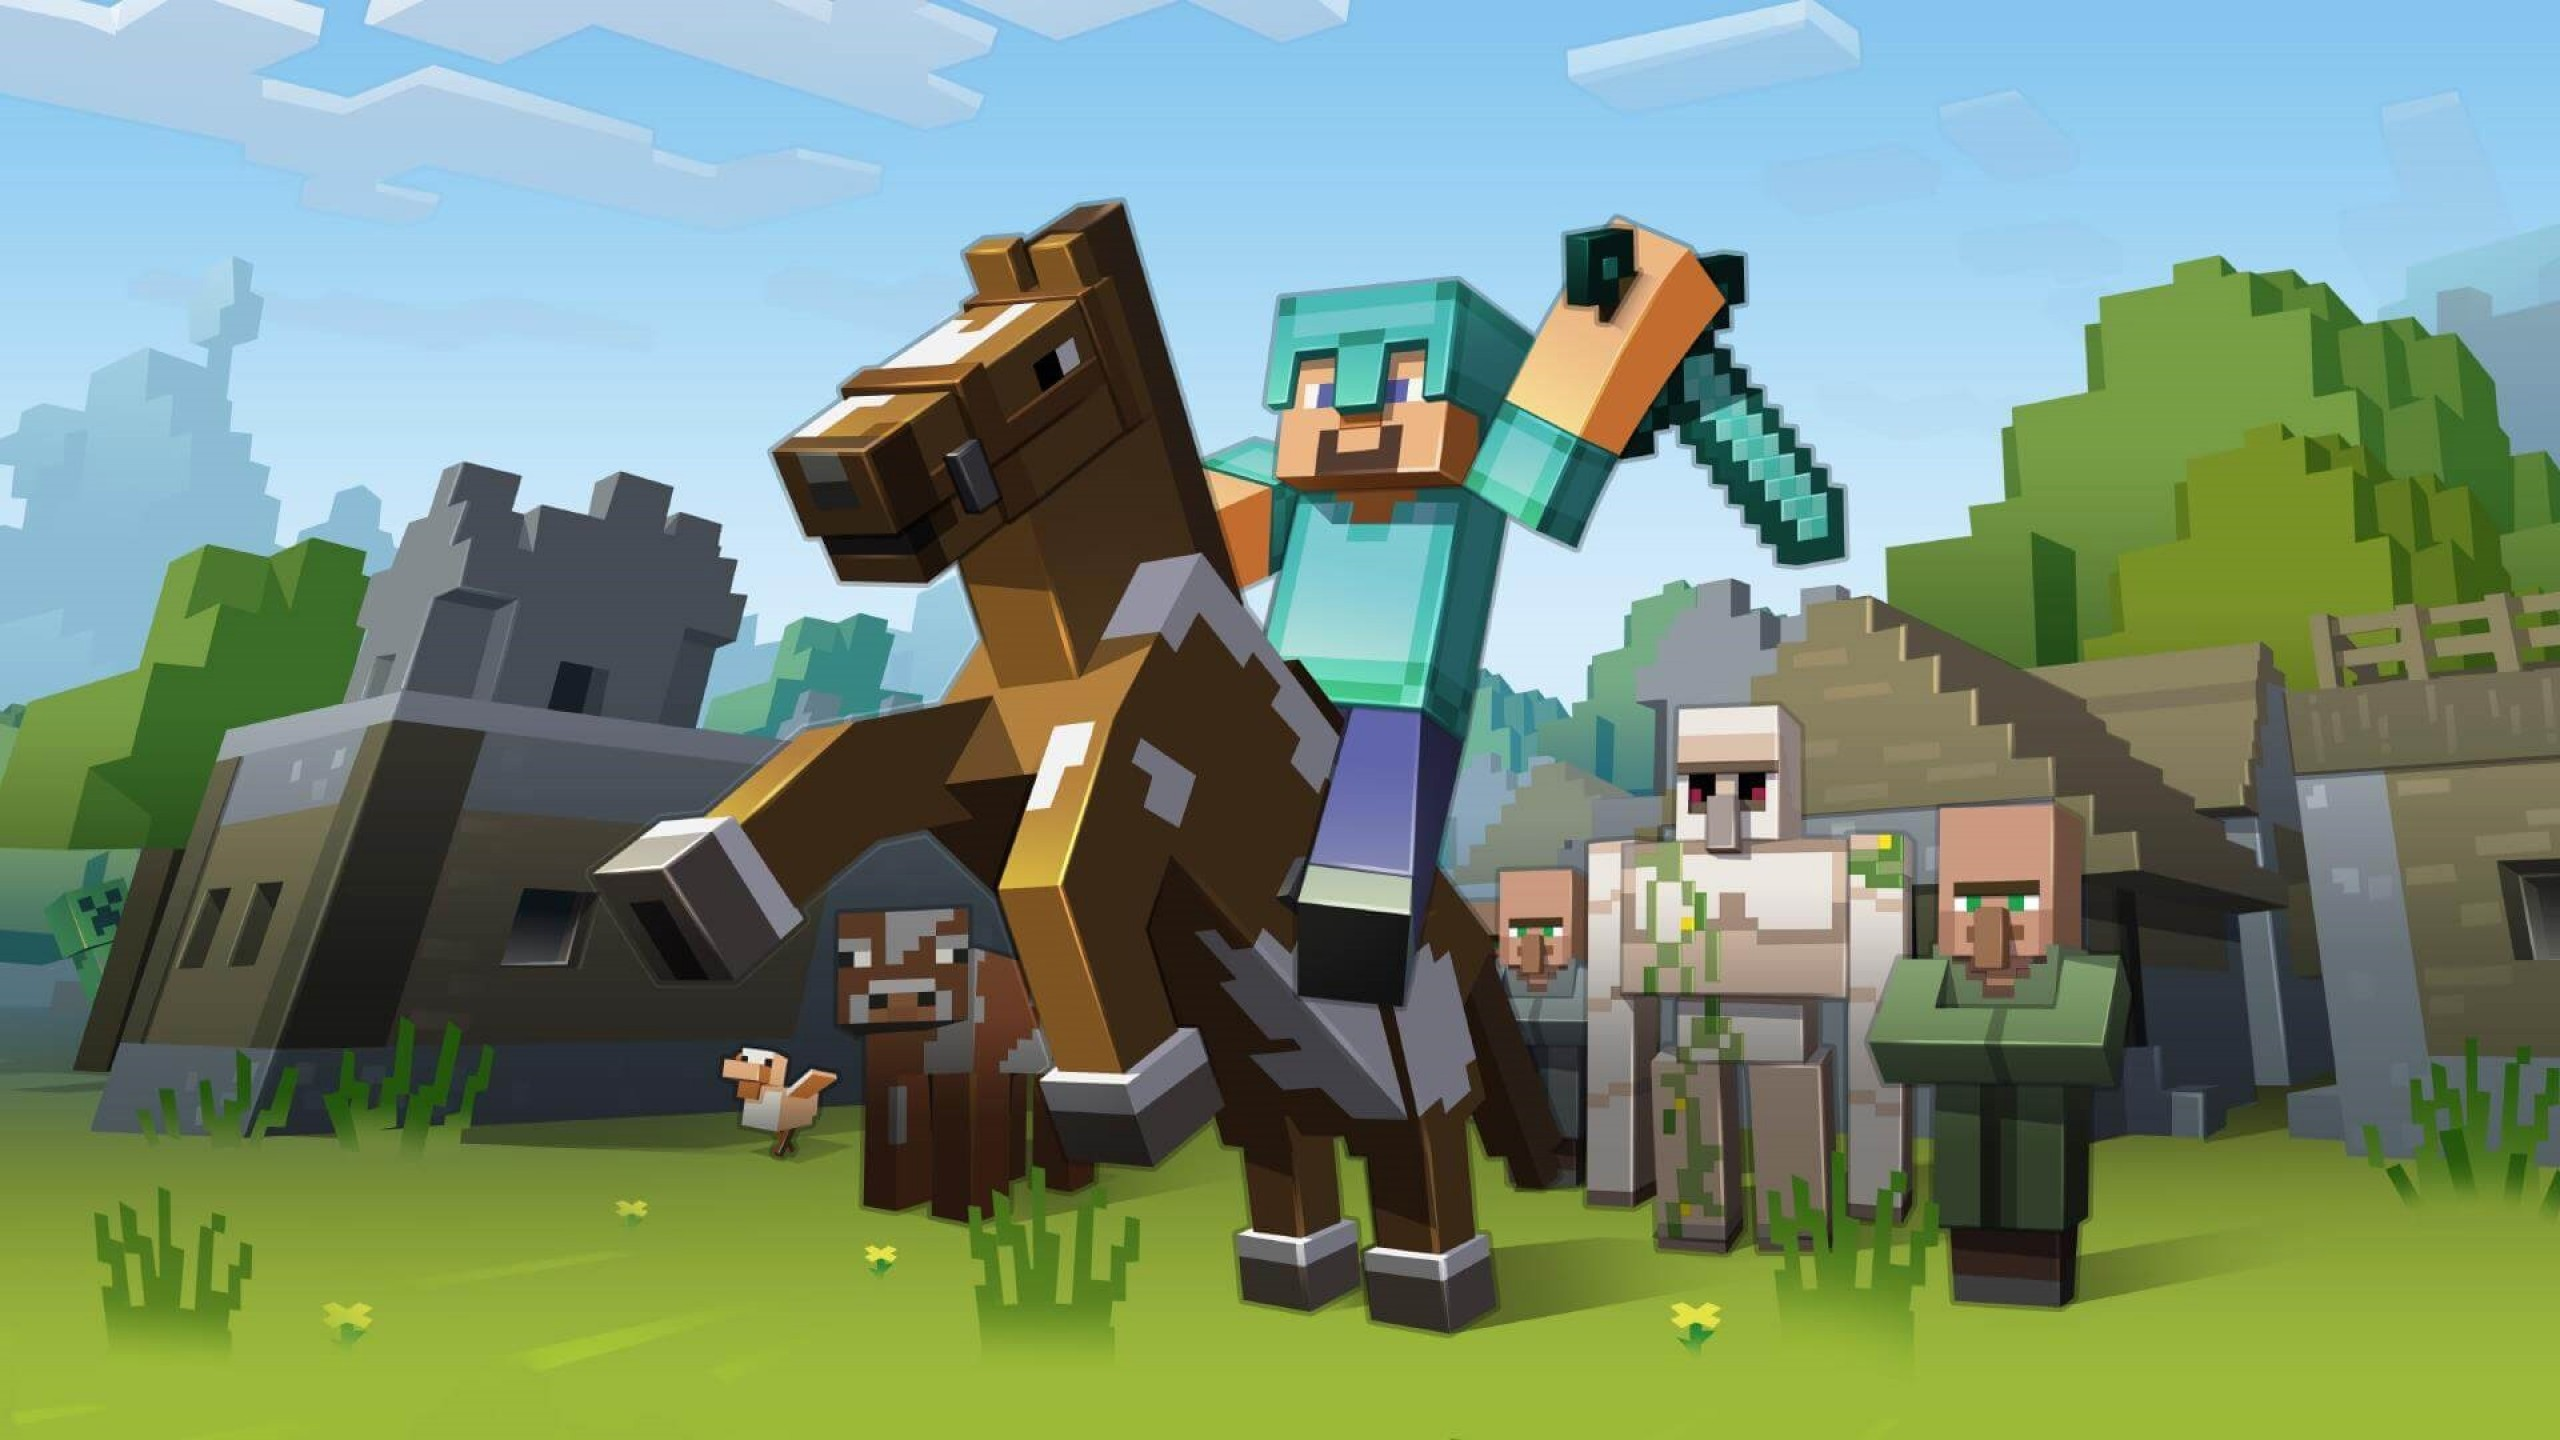 2560x1440 Minecraft Wallpapers On Wallpaperdog